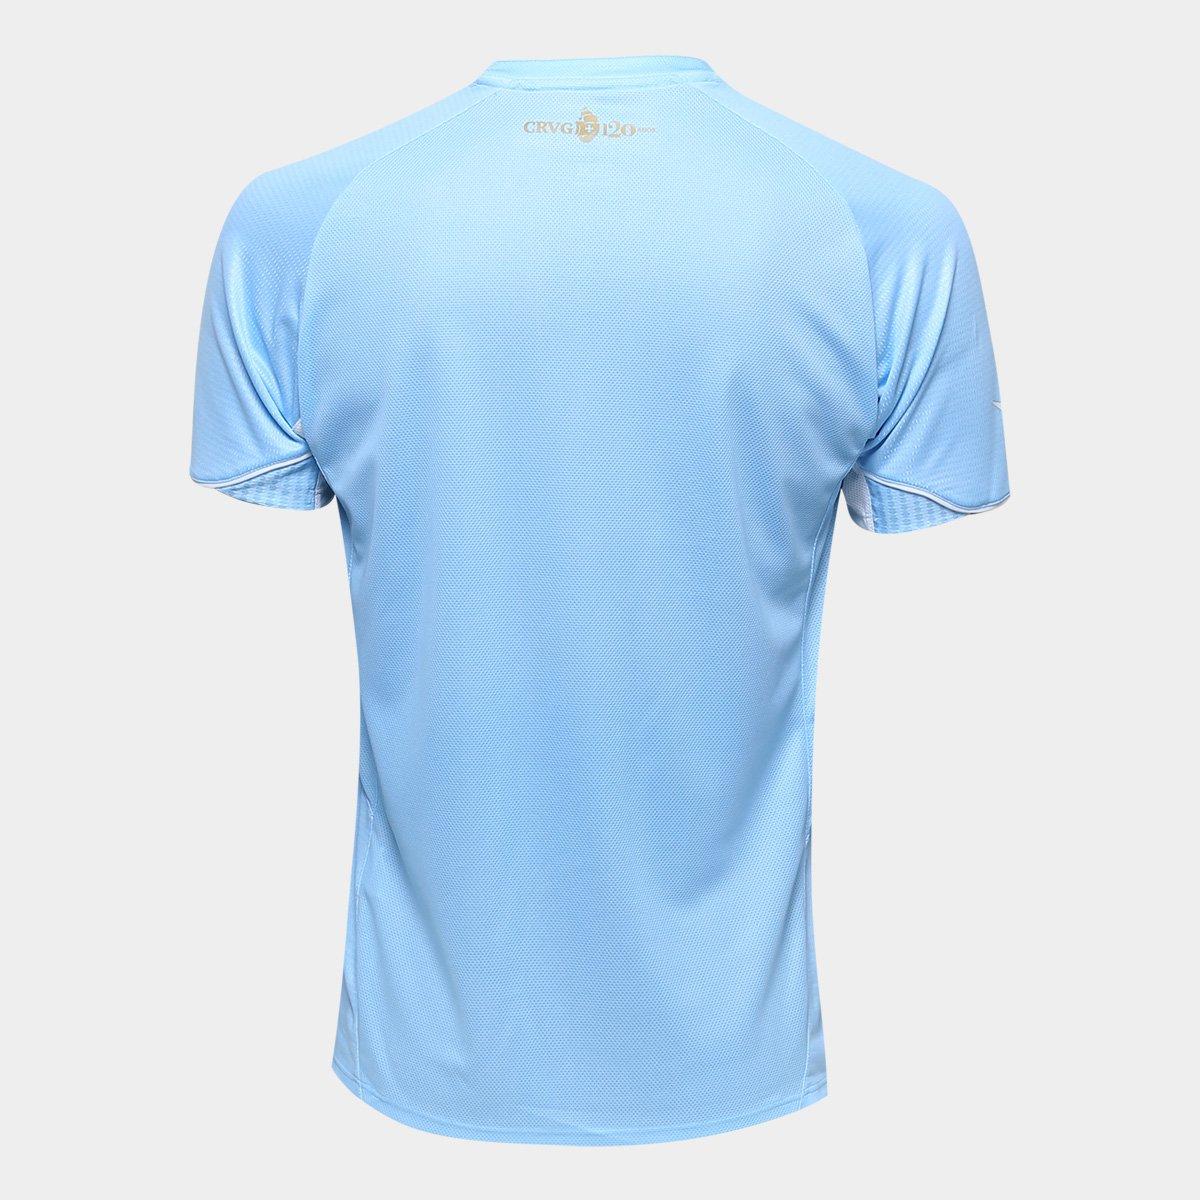 ... Camisa de Goleiro Vasco I 2018 s n° Torcedor Diadora Masculina ... 60073733b3176